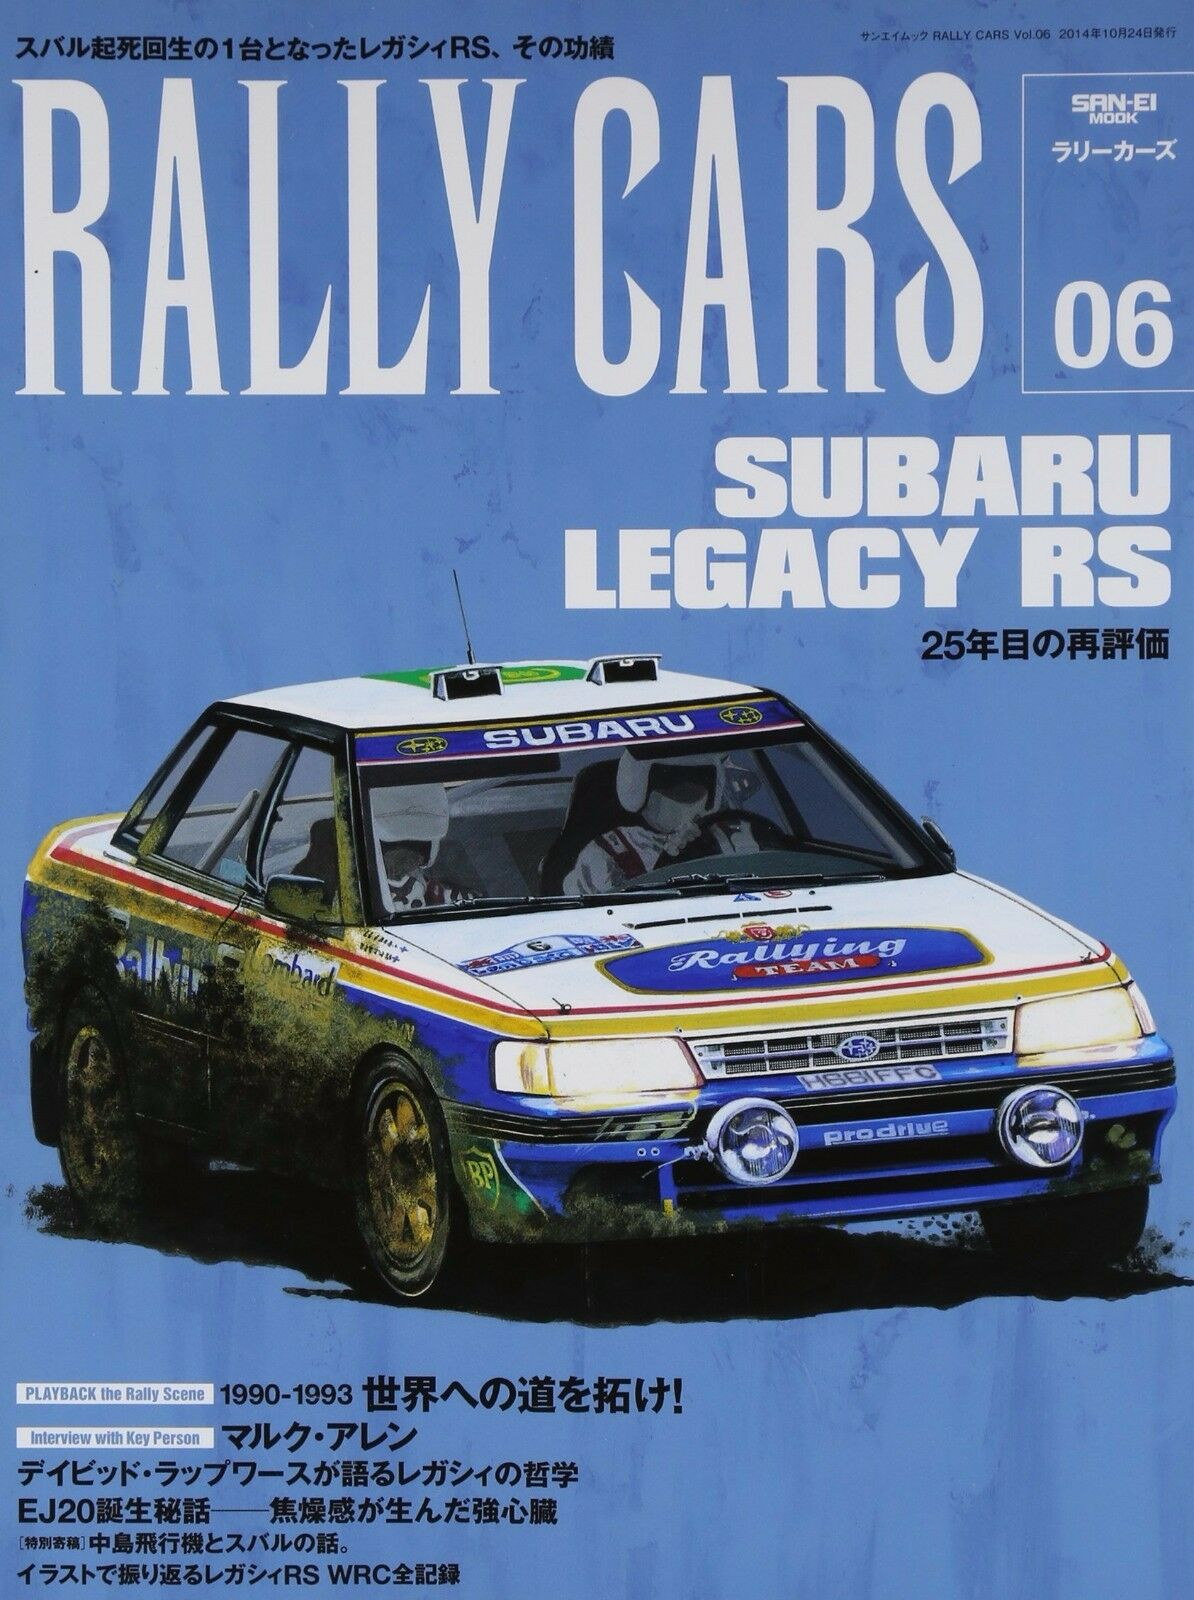 RALLY CARS Vol.06 SUBARU LEGACY RS Book Free Shipping!